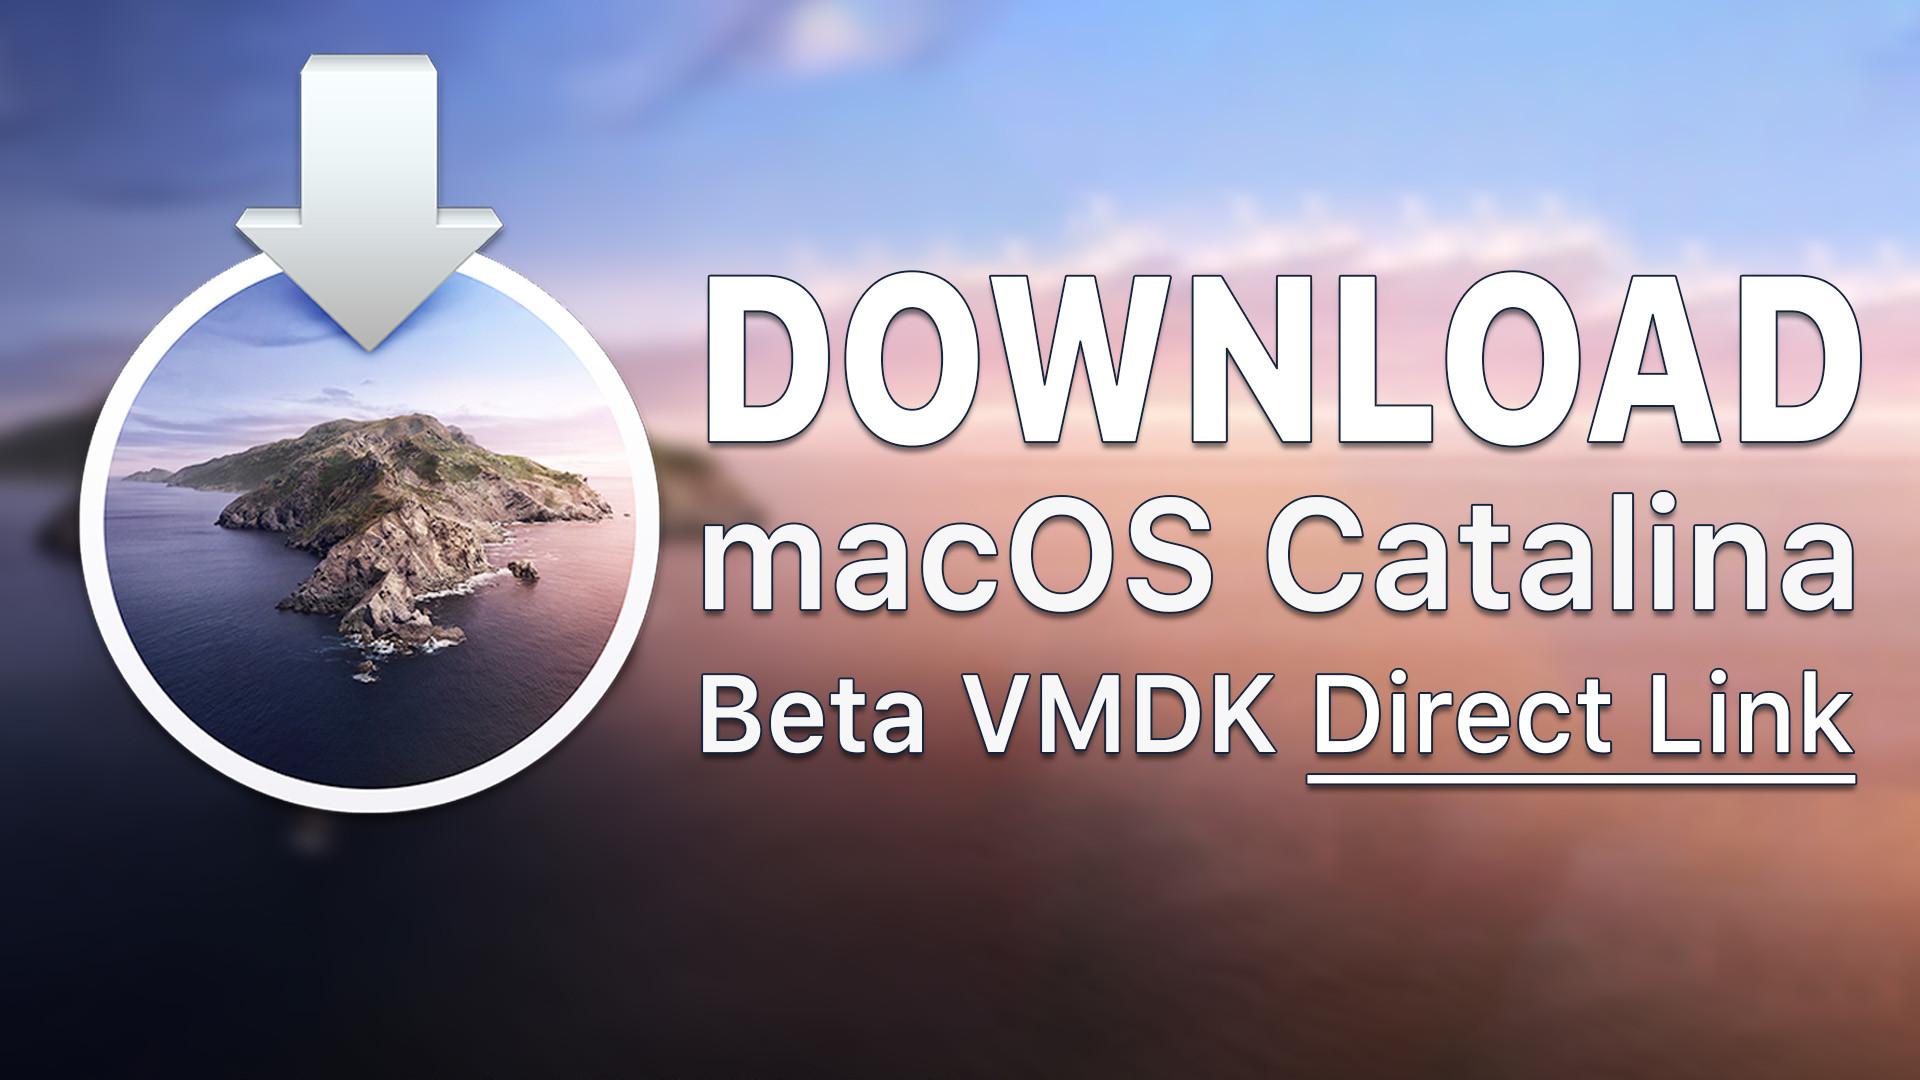 Download macOS Catalina Image for VMware & VirtualBox